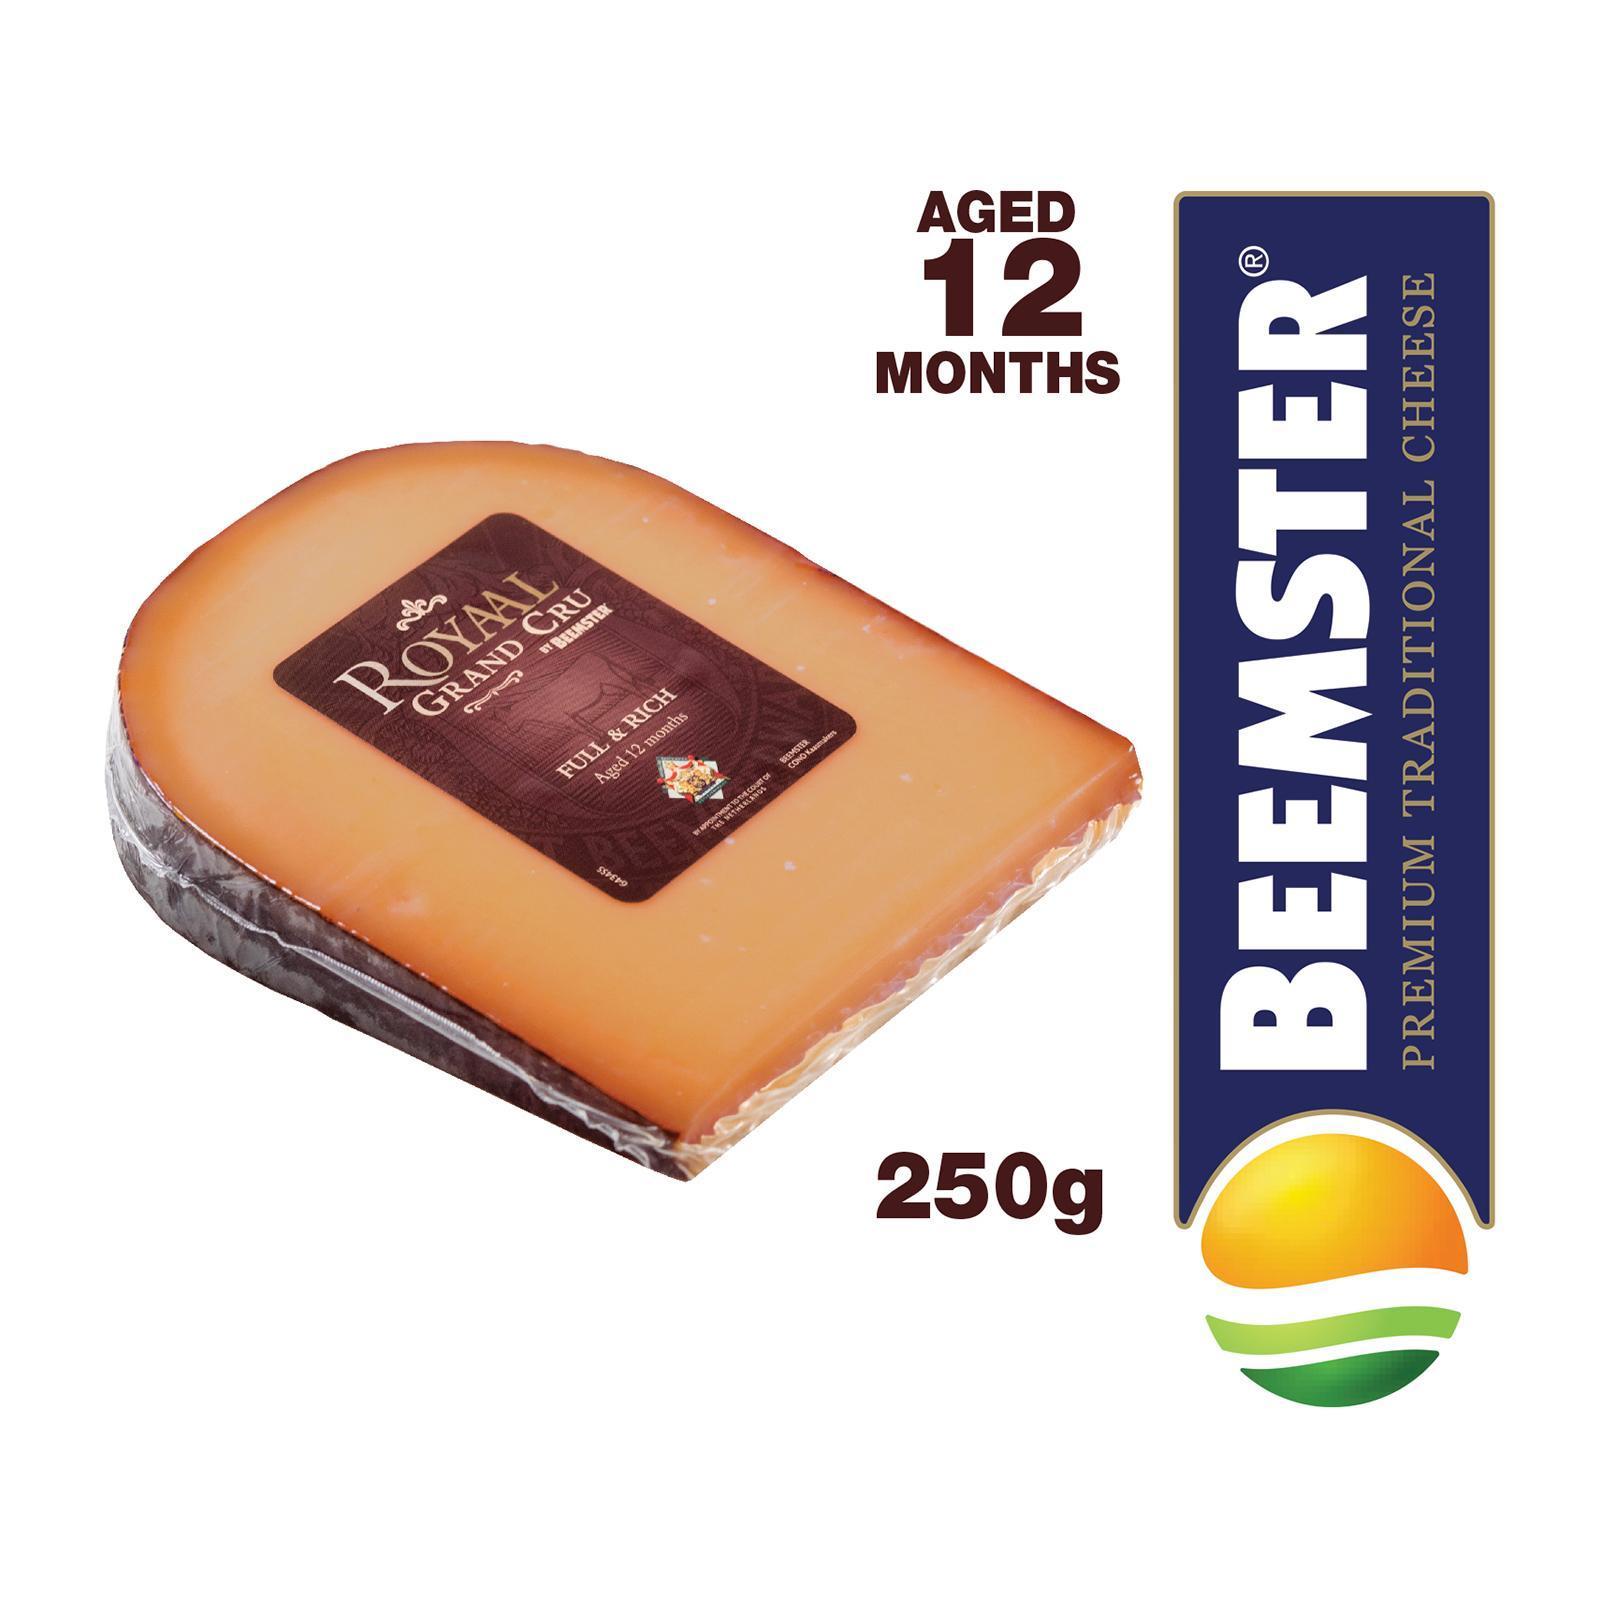 Beemster Royaal Grand Cru Dutch Gouda Cheese - By Sonnamera